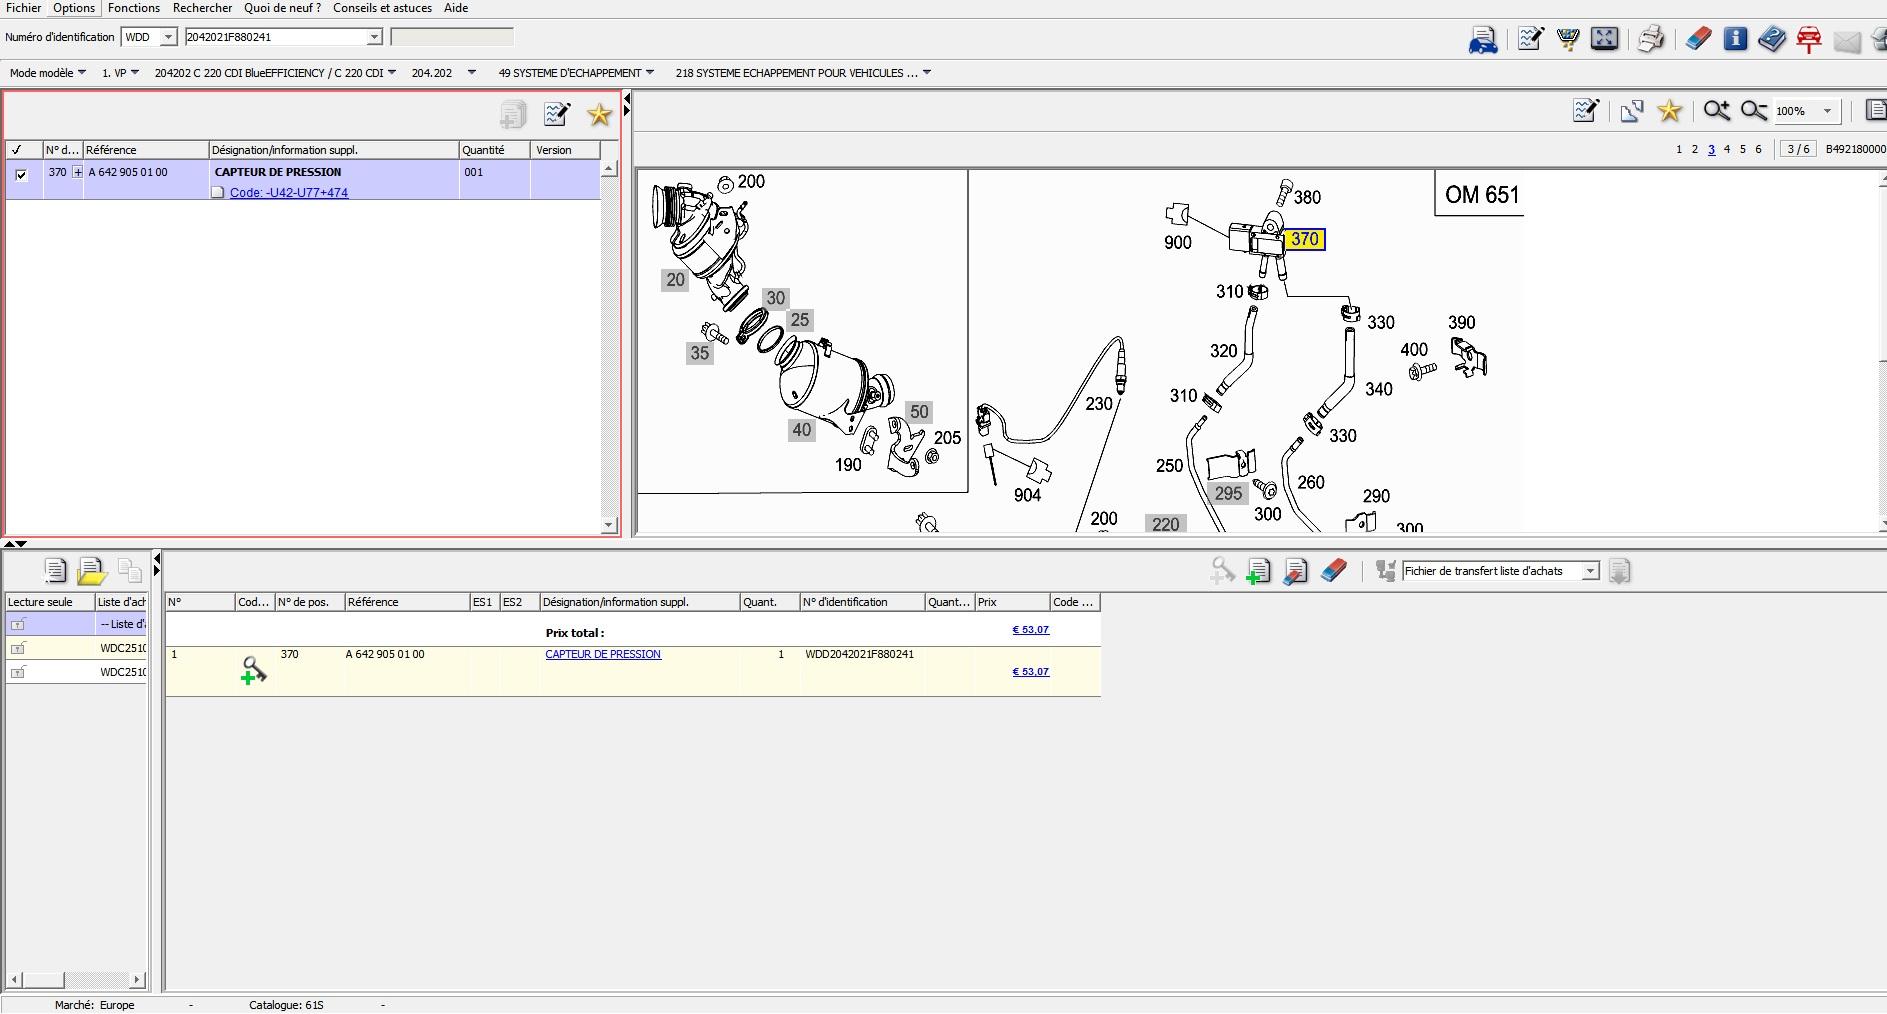 capteur-pression-1-WDD2042021F880241.jpg